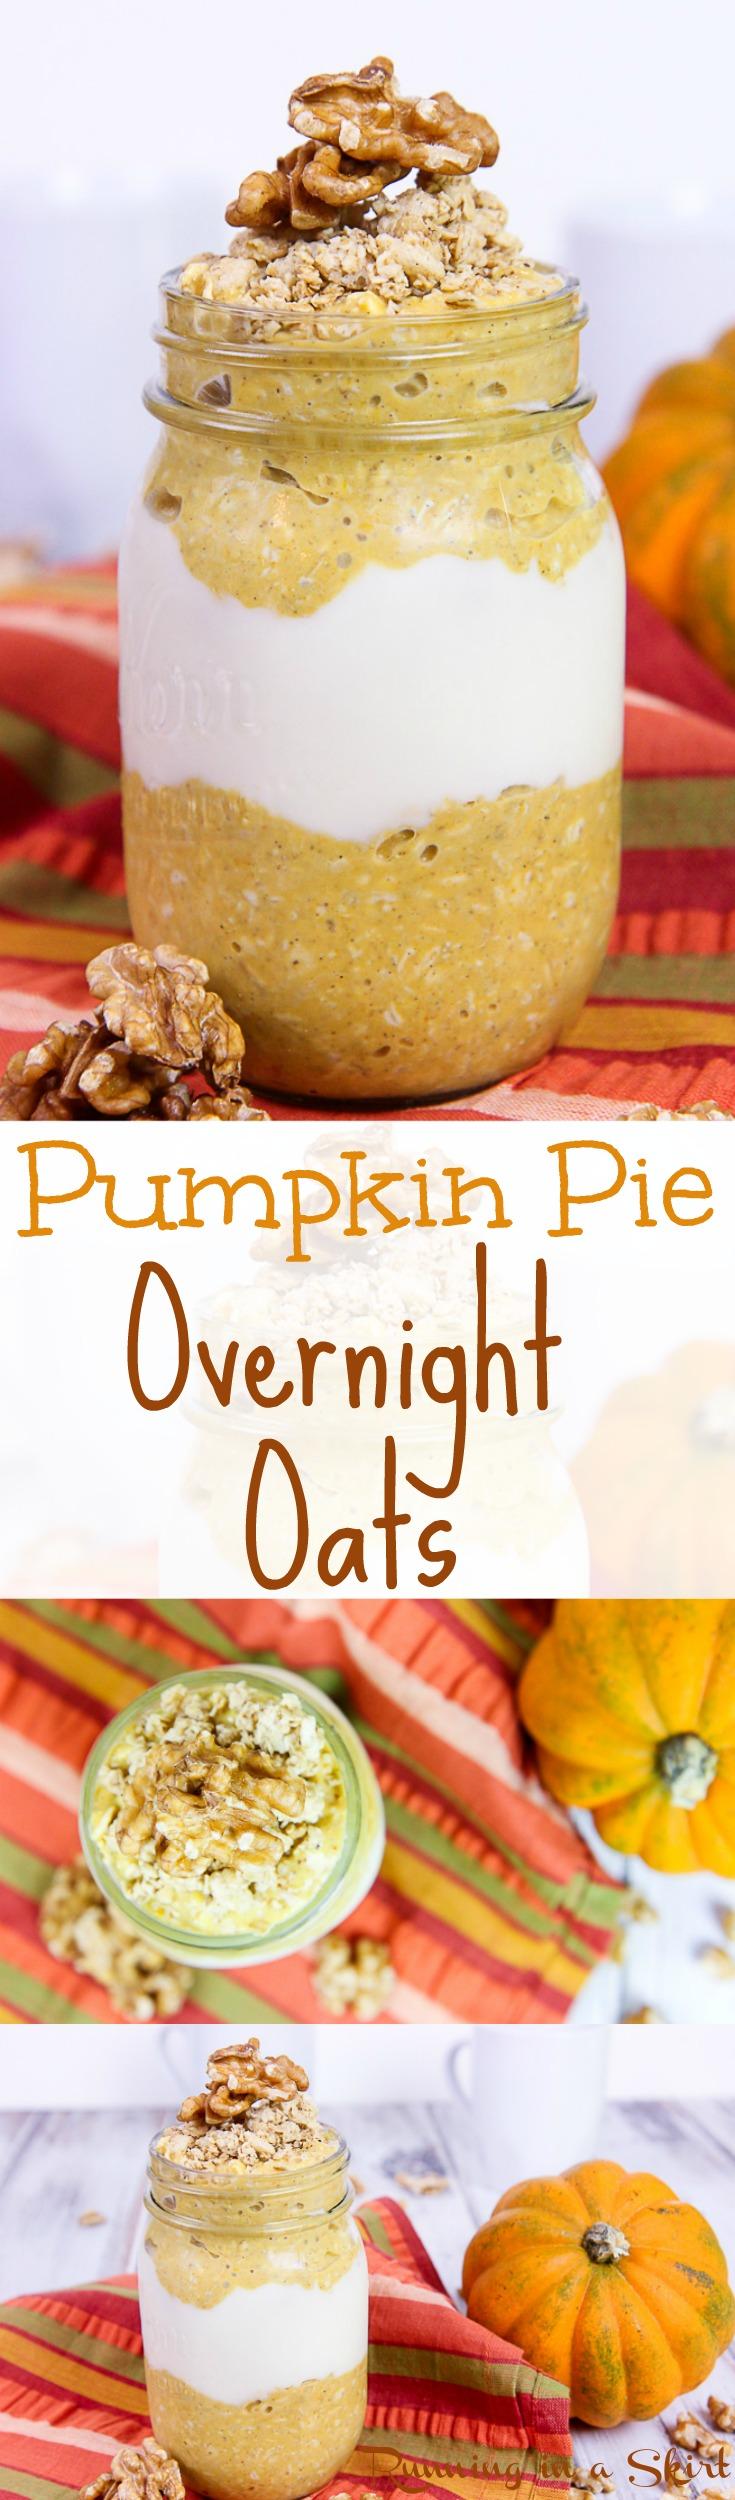 Healthy Pumpkin Pie Overnight Oats